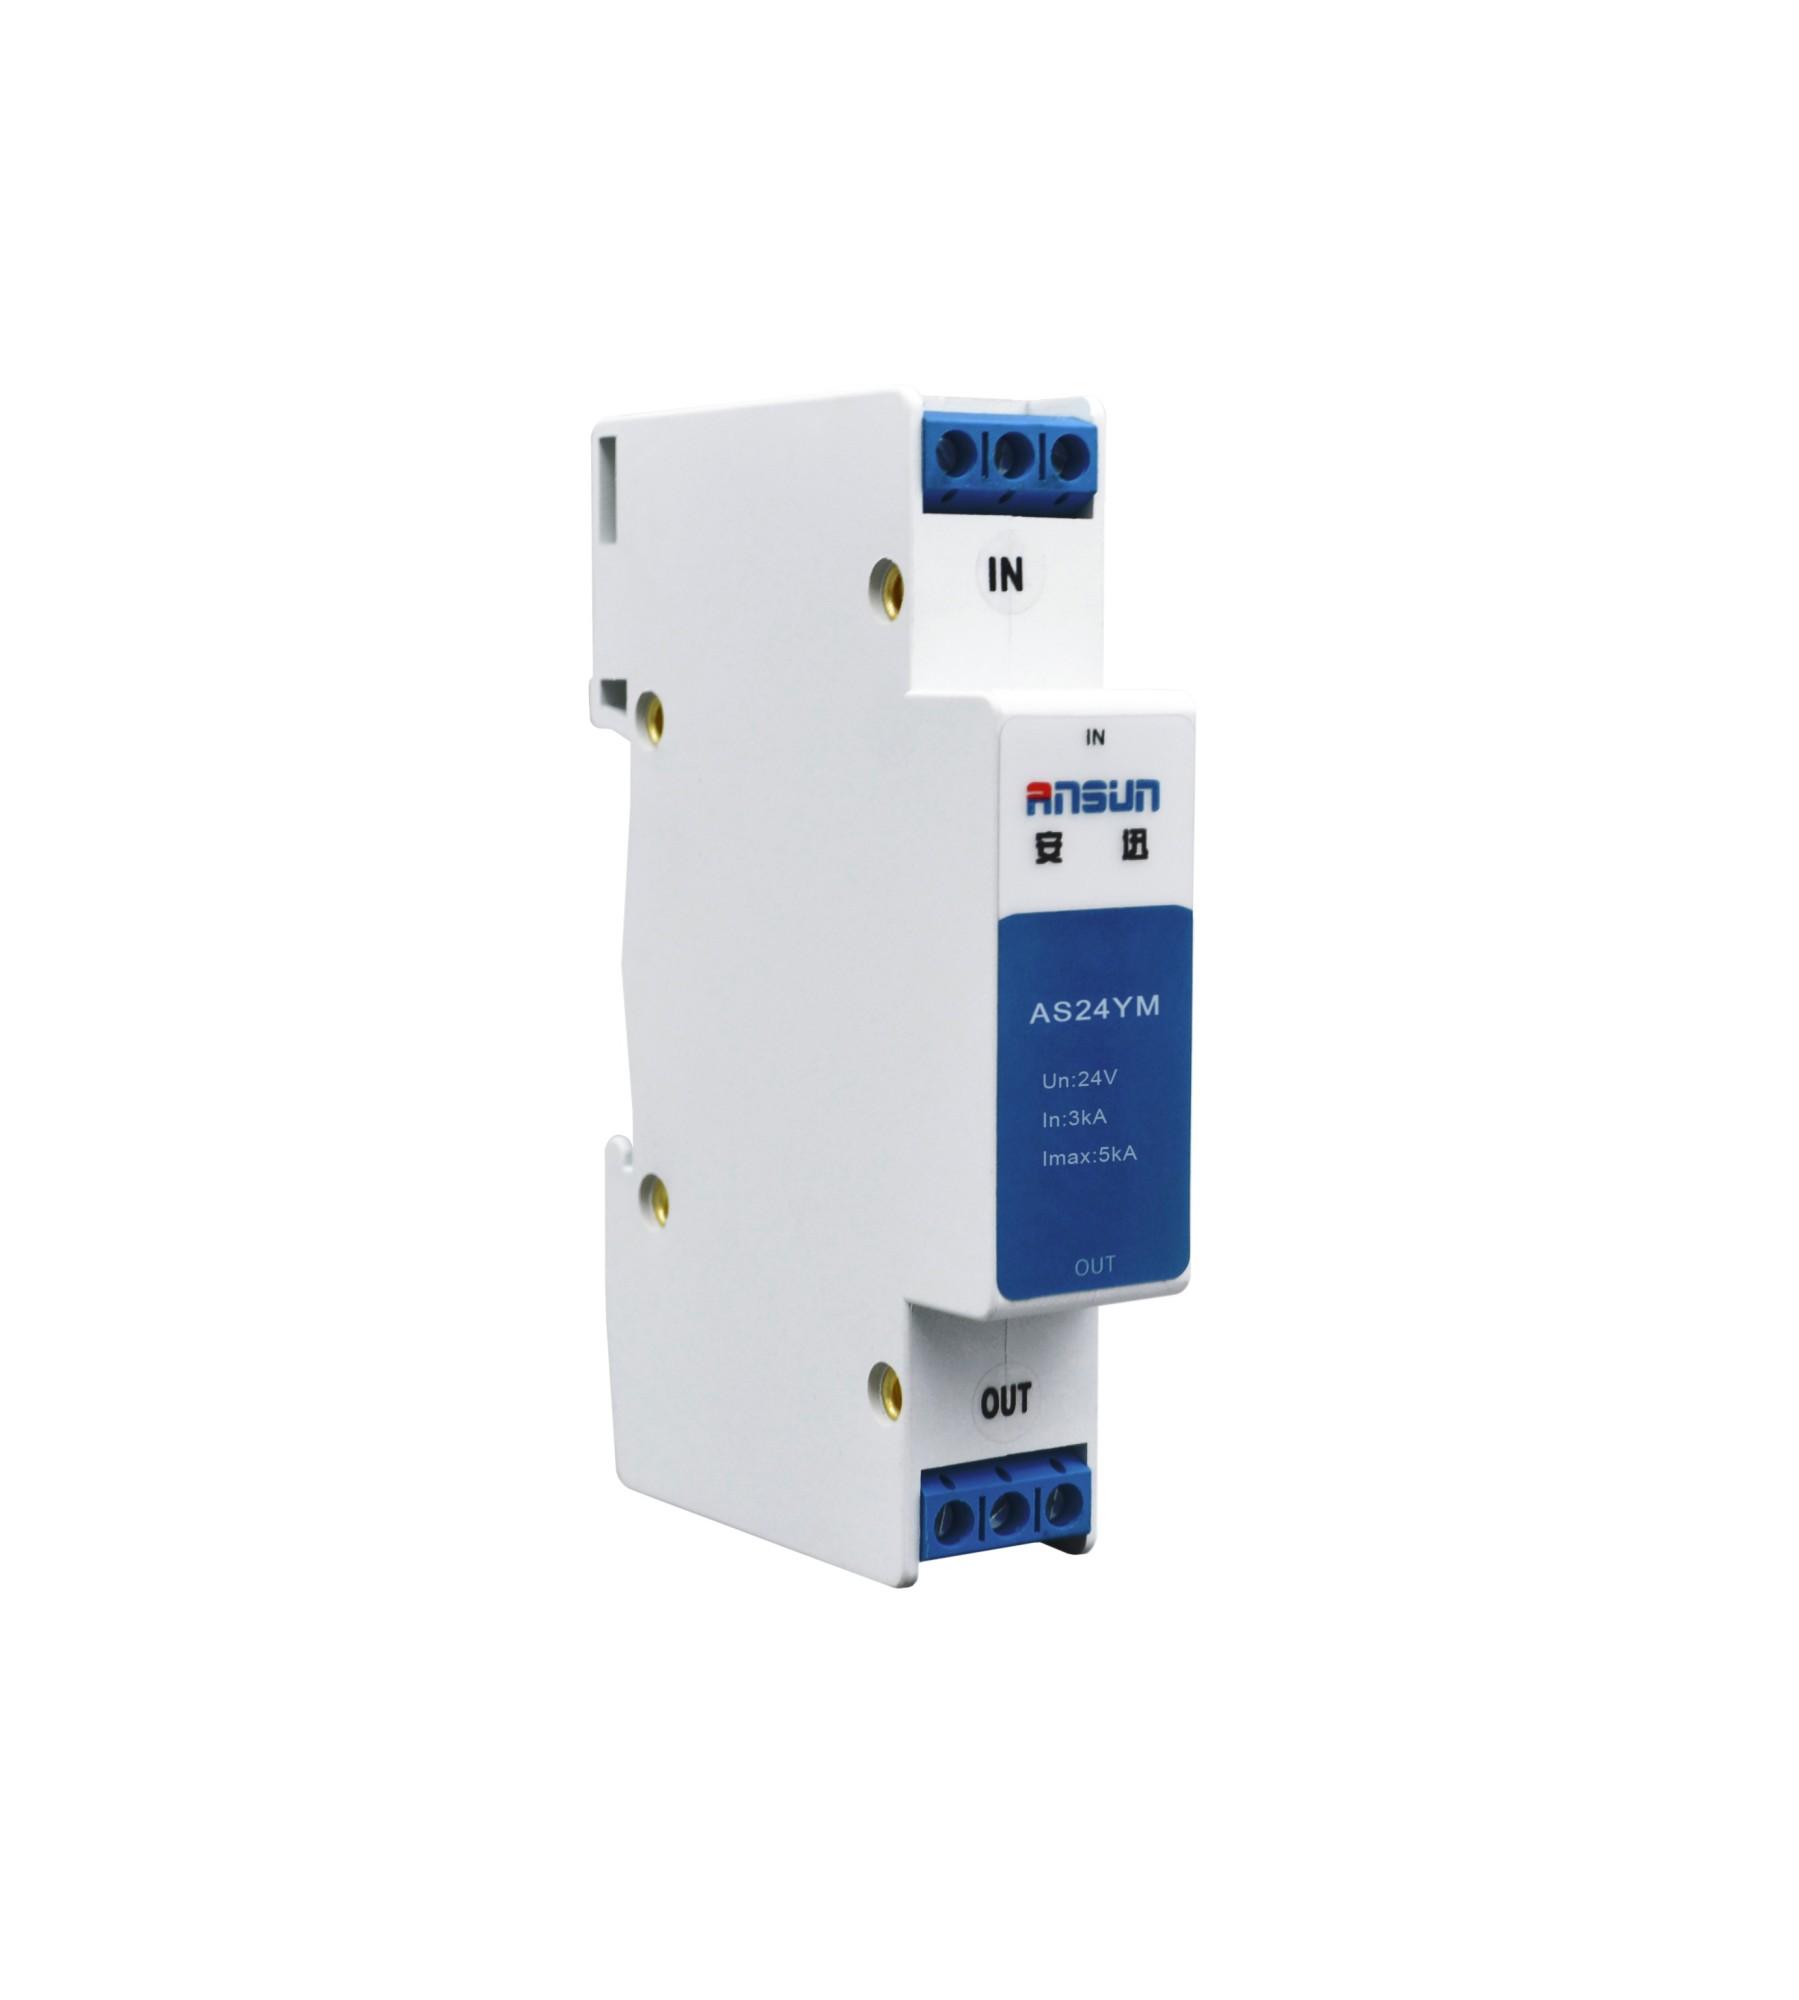 4-20mA模拟量信号万博manbetx安卓版器--AS24YM